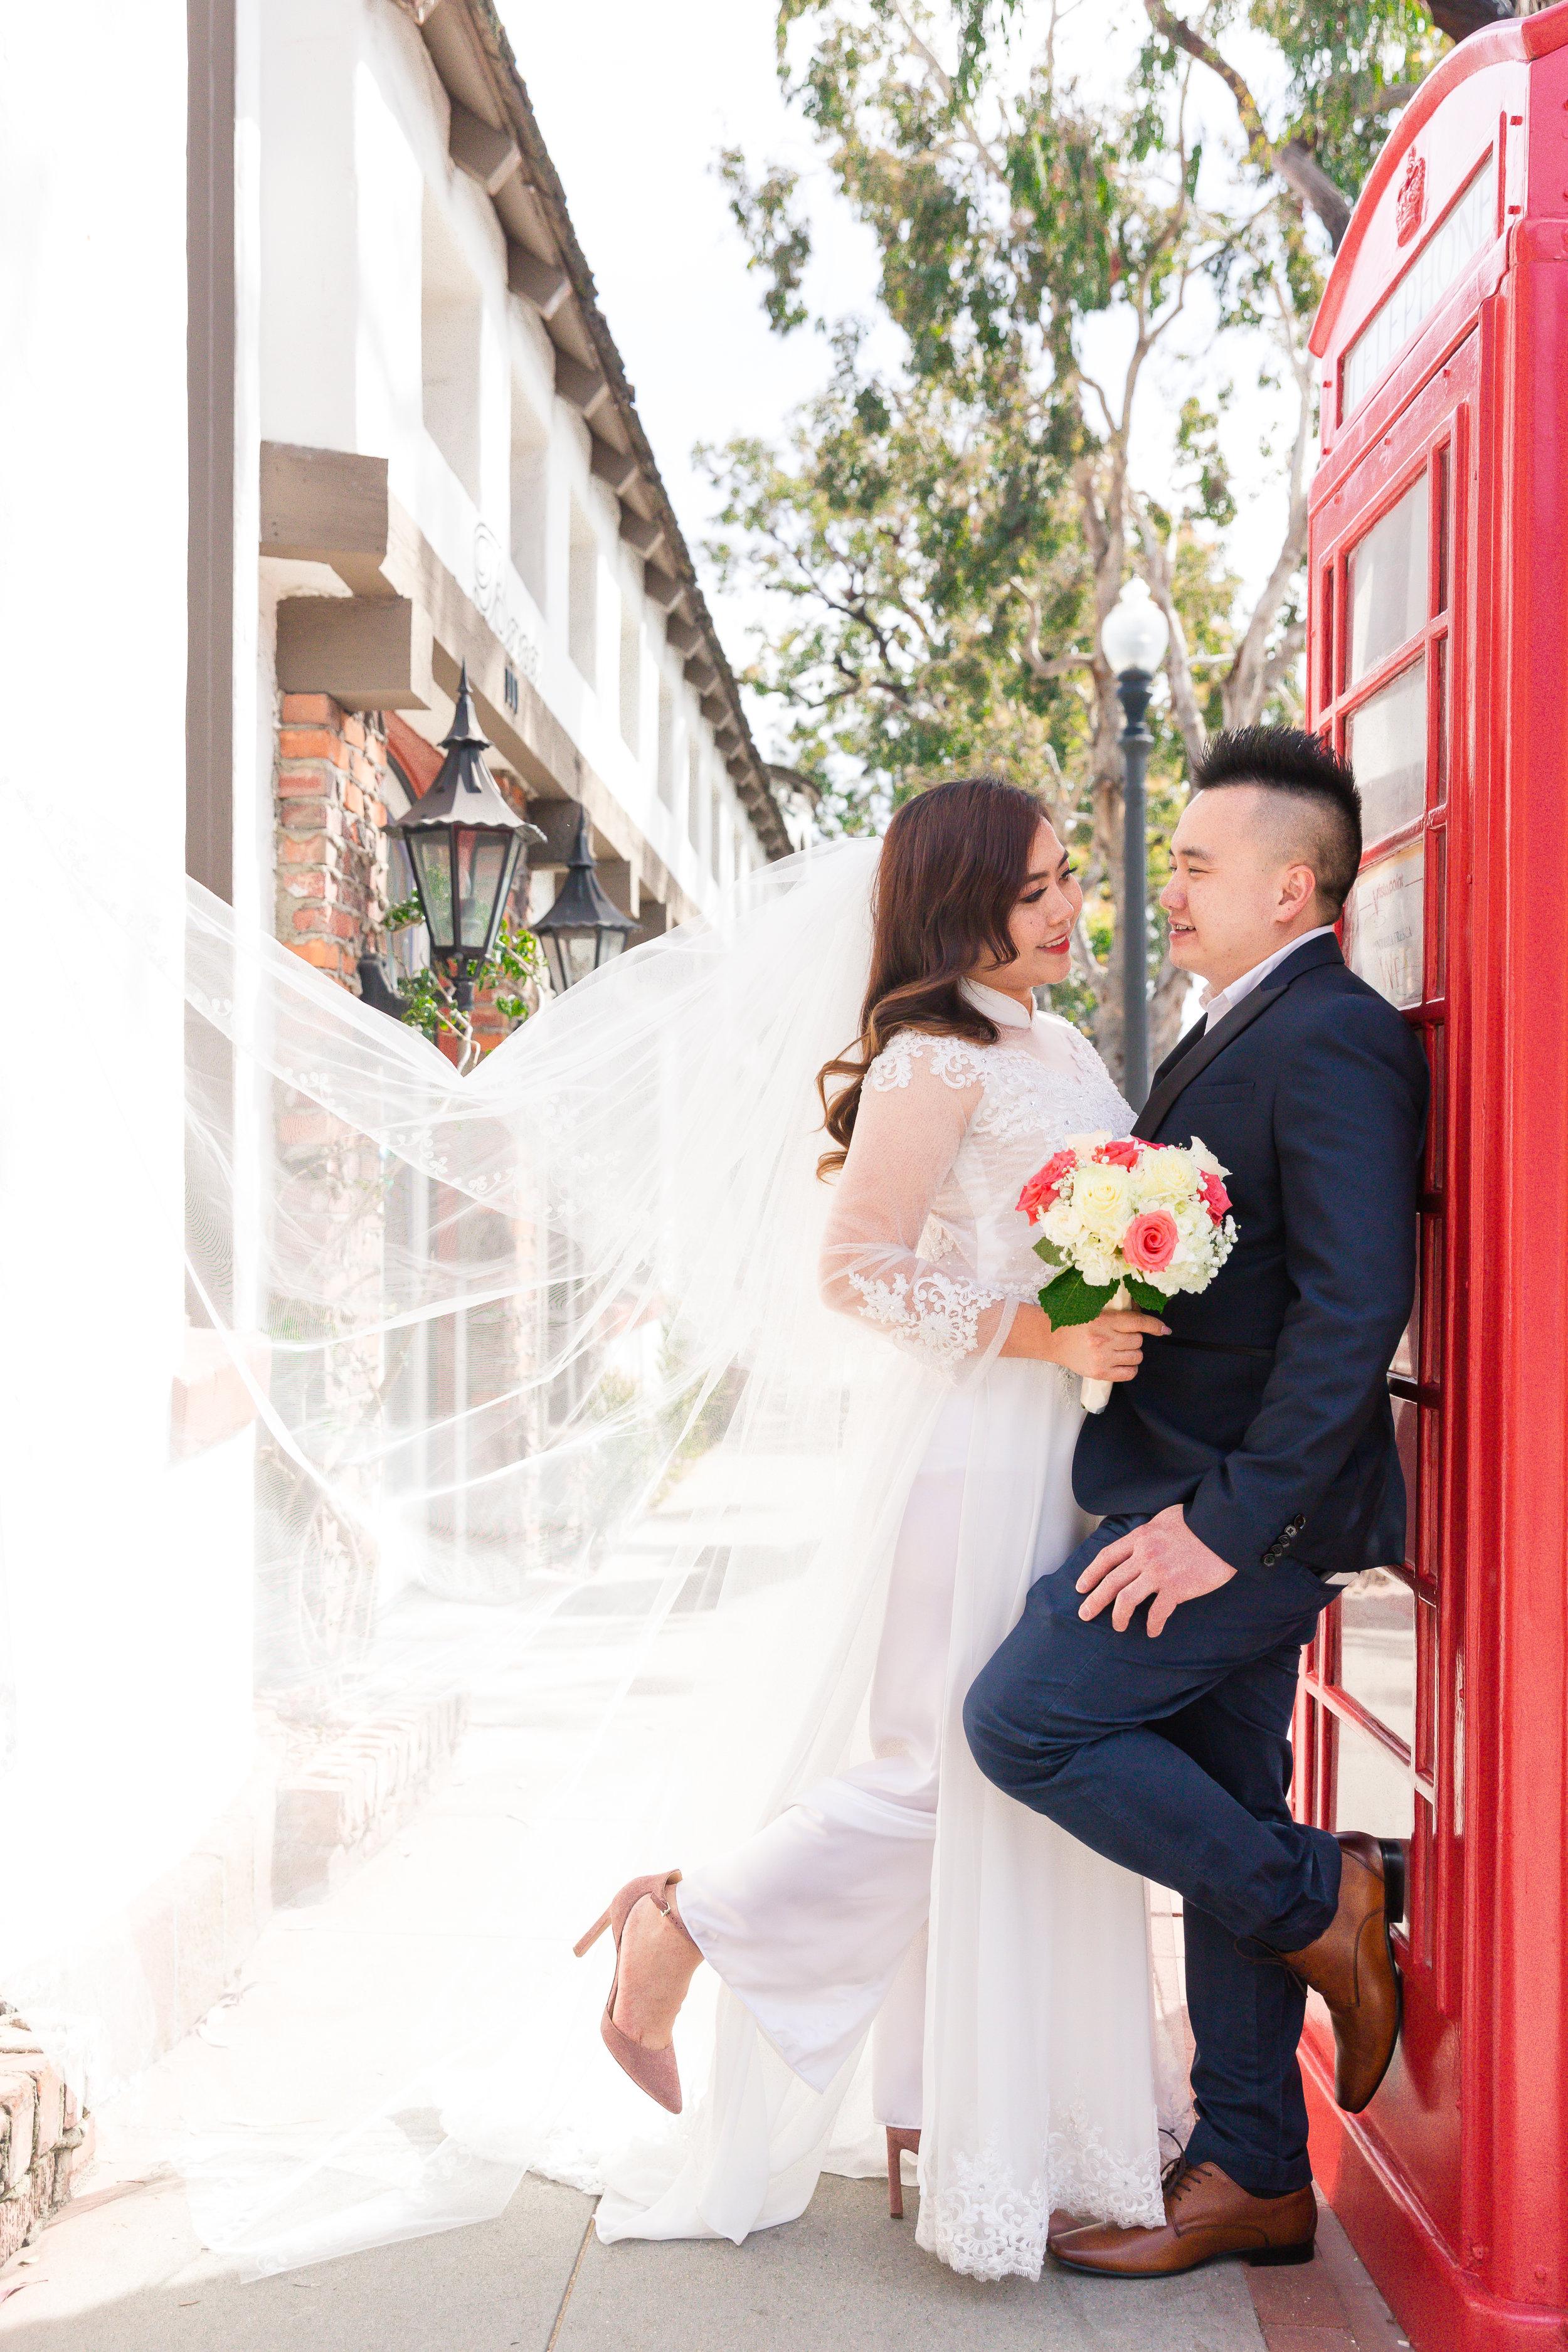 JasonSnorlaxphotography_Thanh & James_Engagement-40.jpg